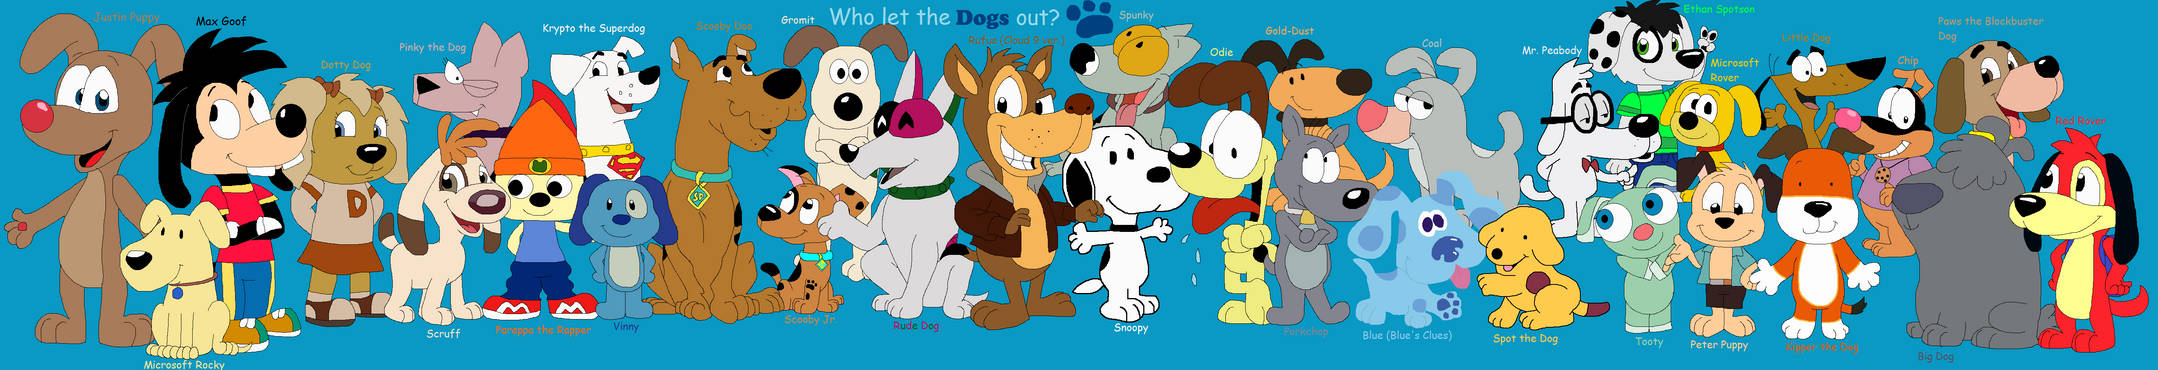 My Favorite Cartoon Dogs